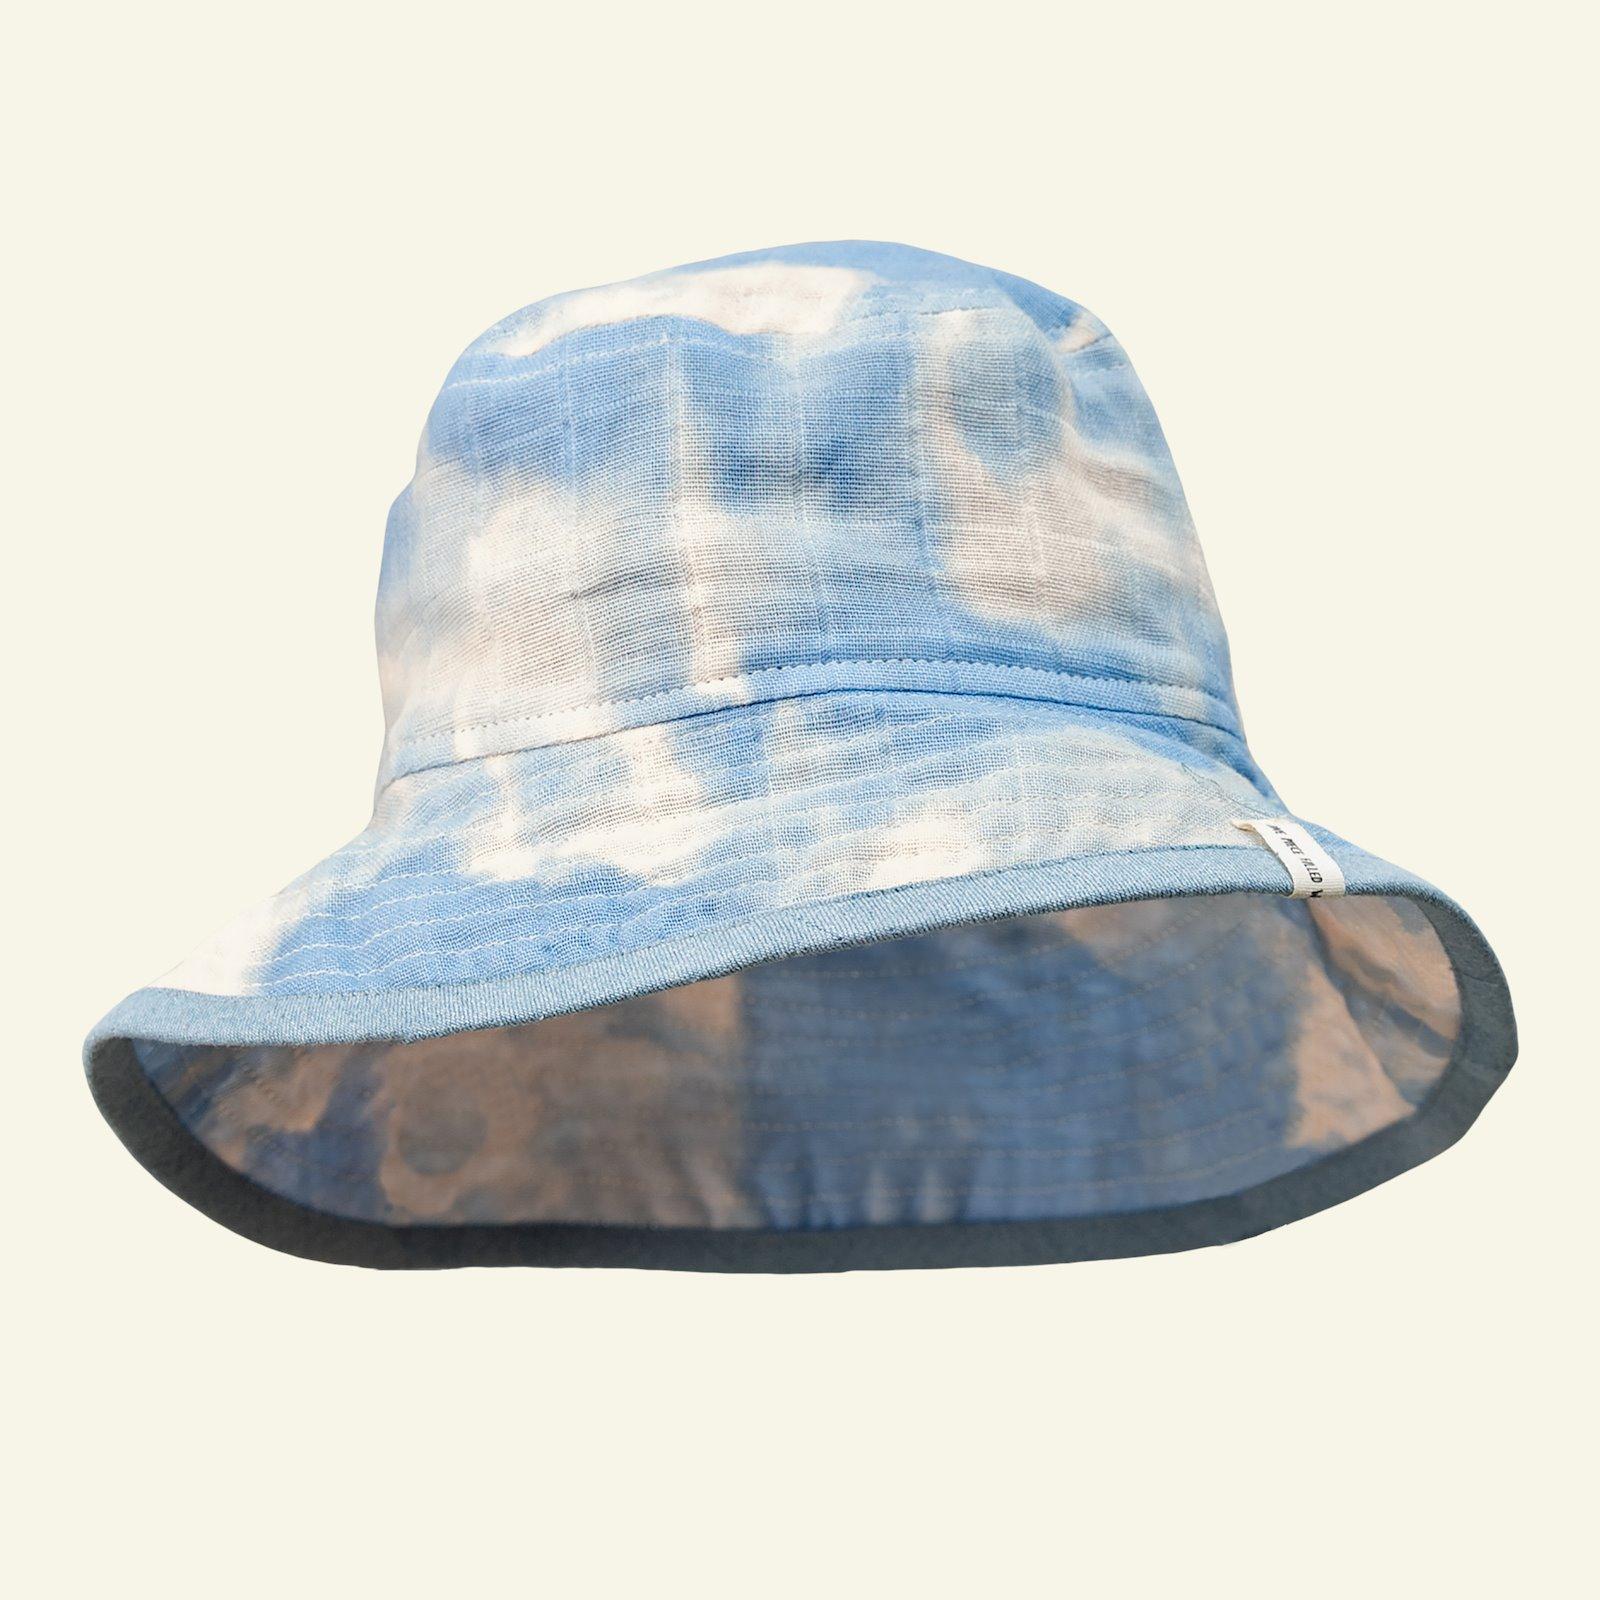 Muslin blue/white batik p84501_501832_64039_sskit